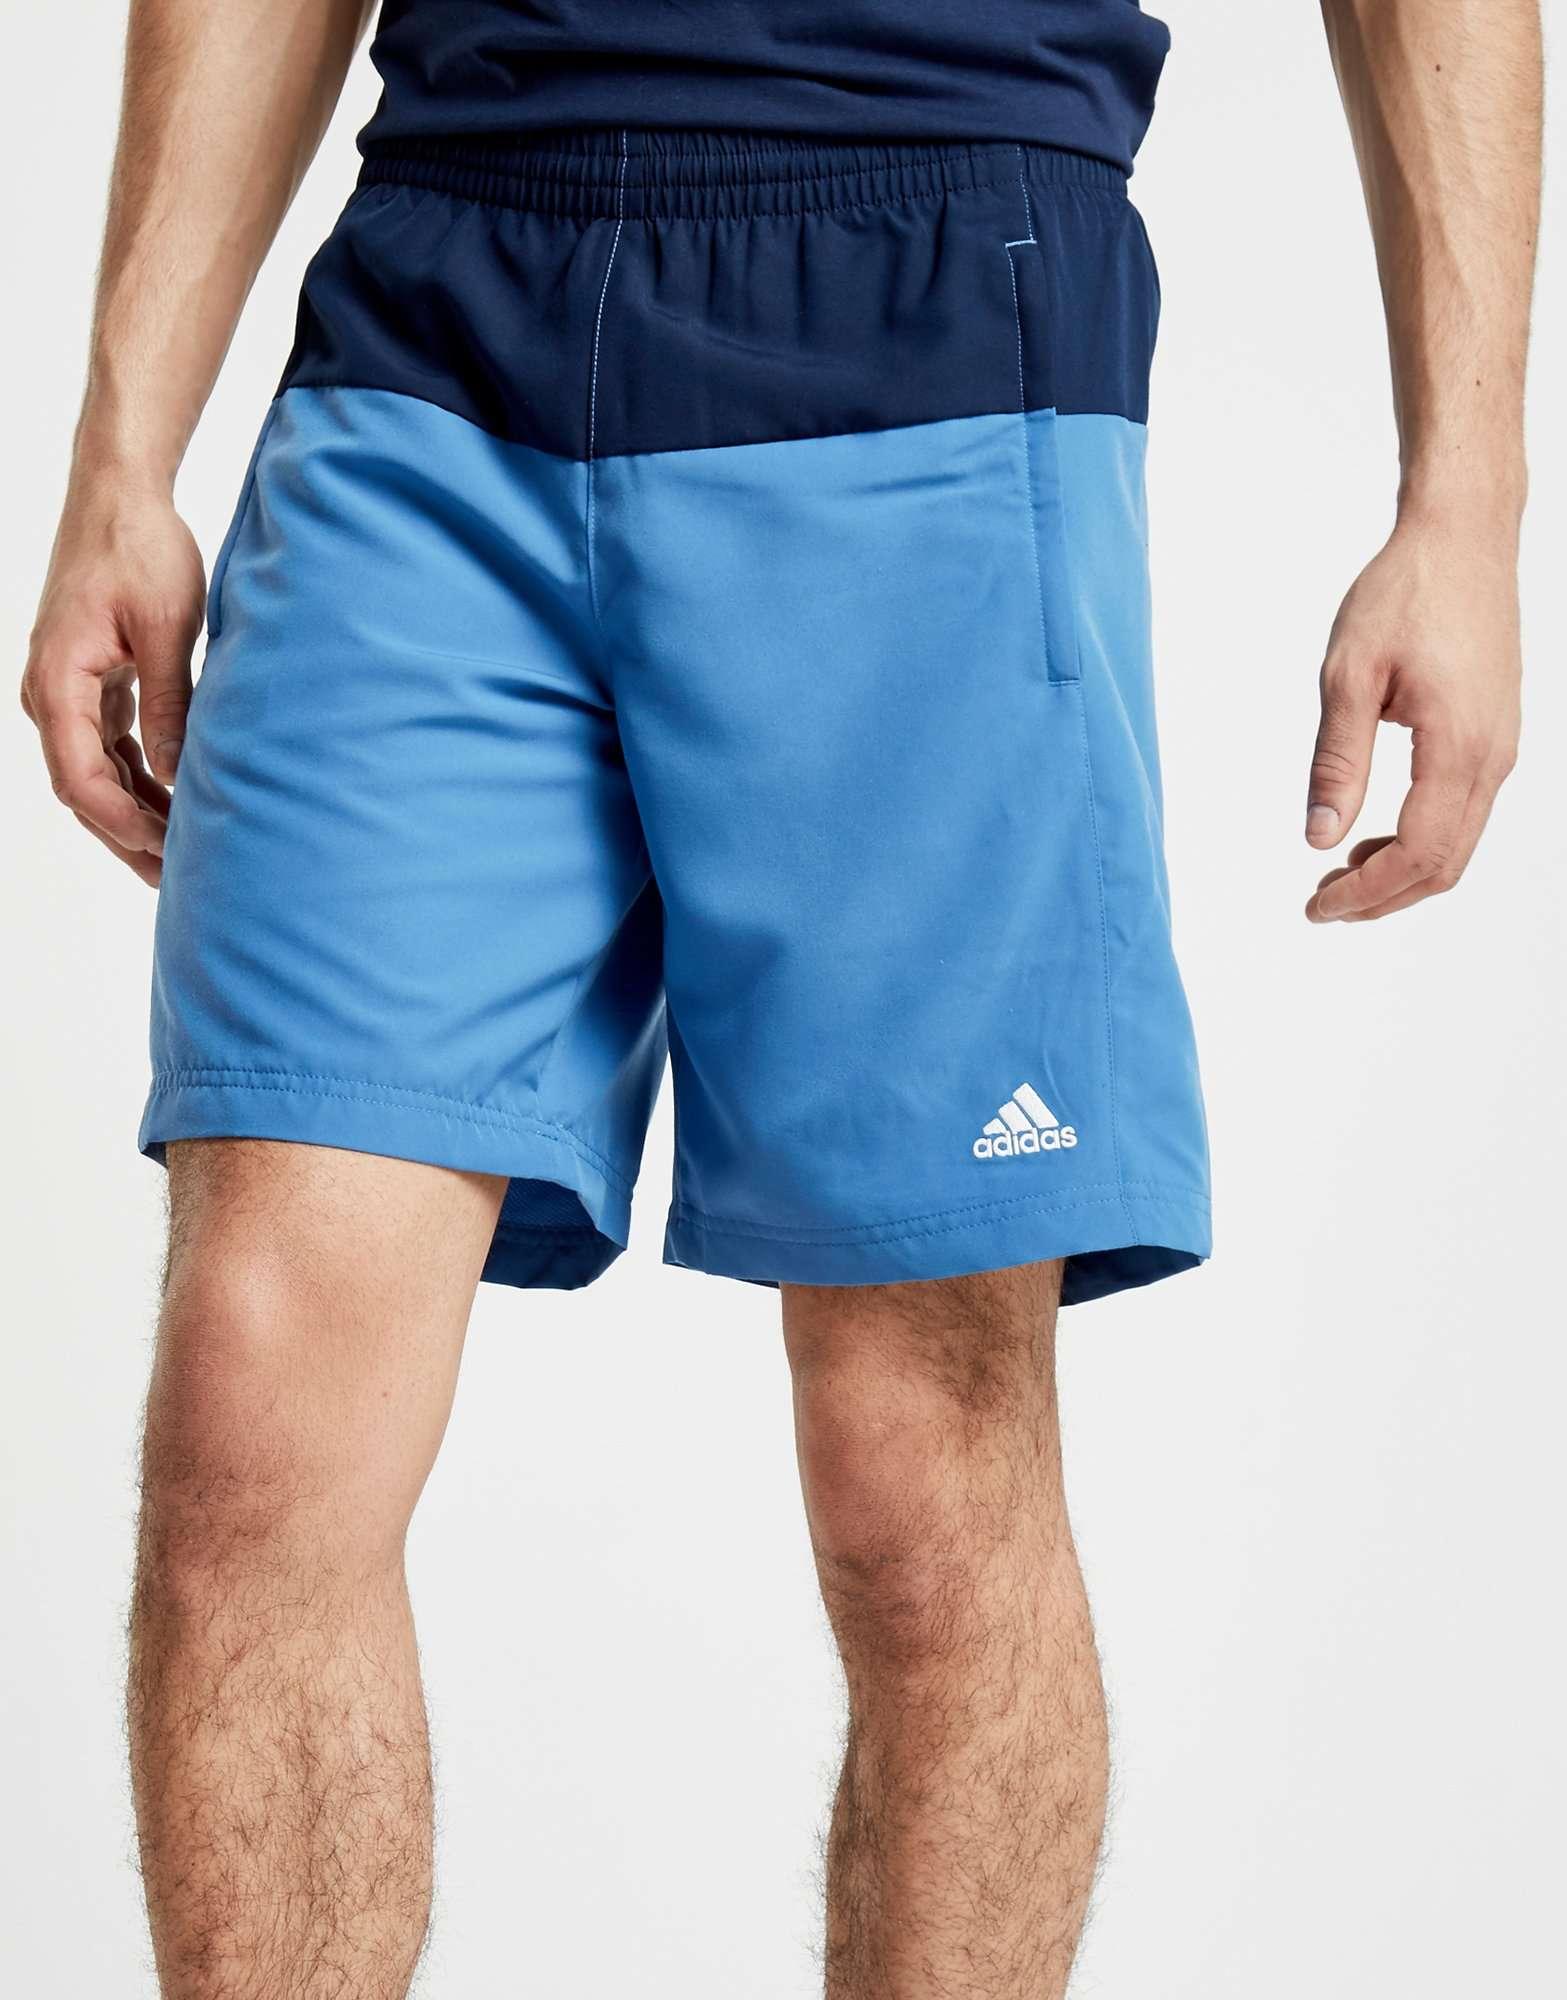 adidas Colourblock Swim Shorts